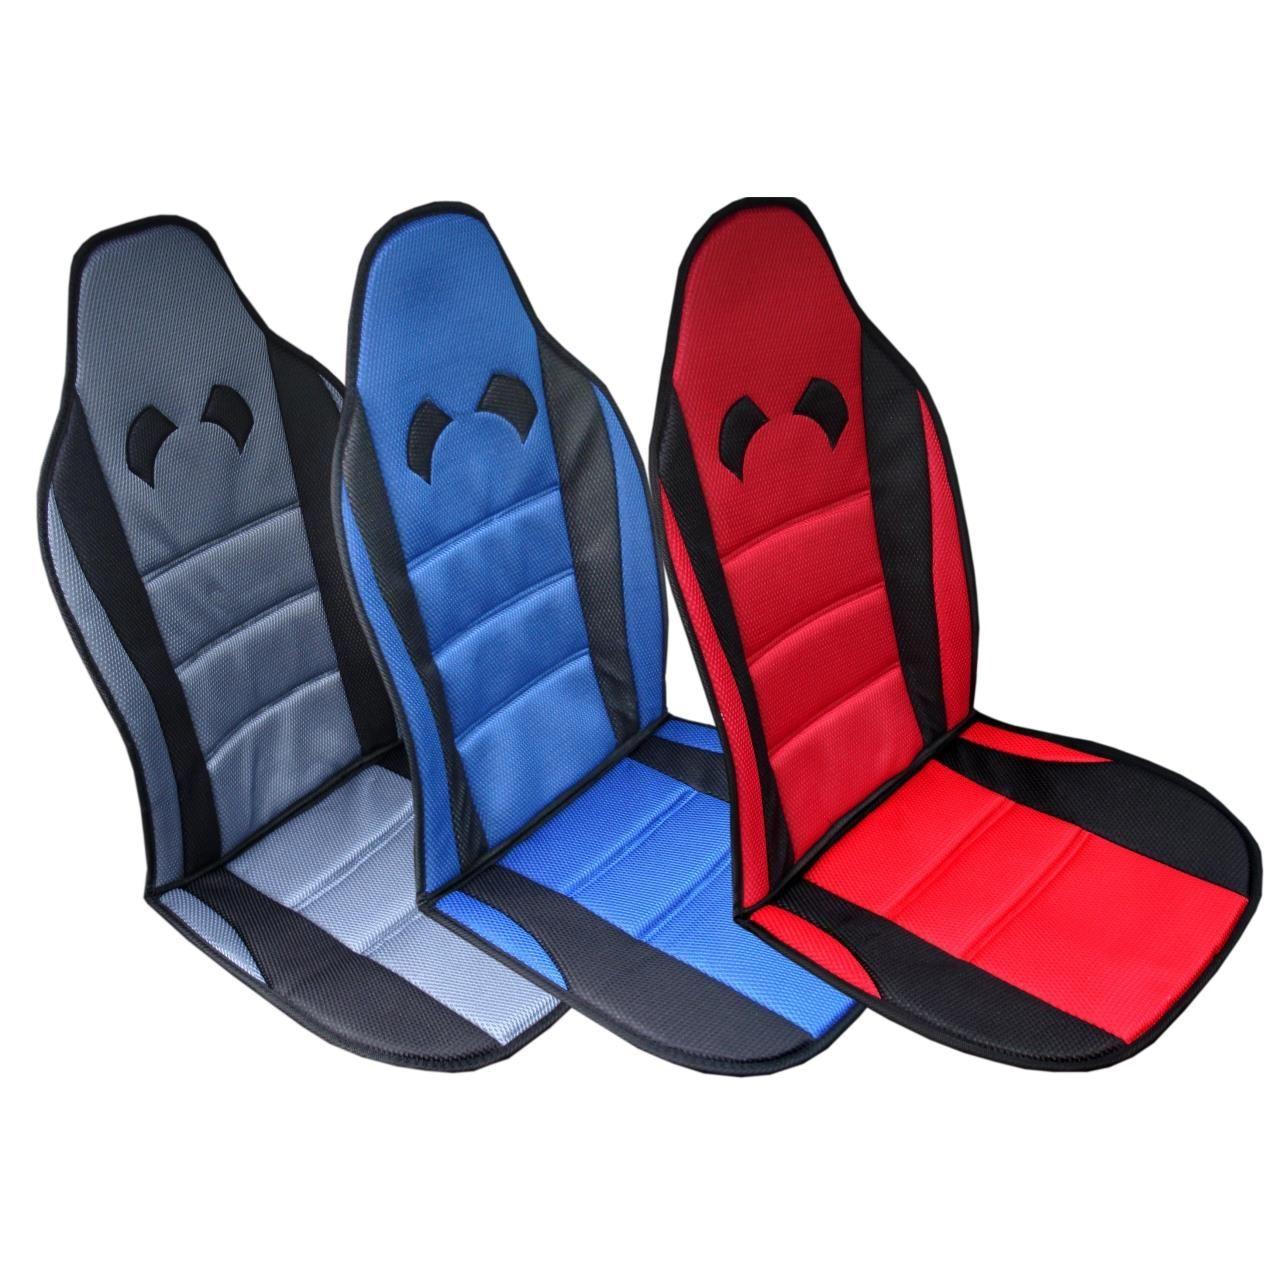 husa scaun auto cu tetiera rogroup microfibra rogroup. Black Bedroom Furniture Sets. Home Design Ideas